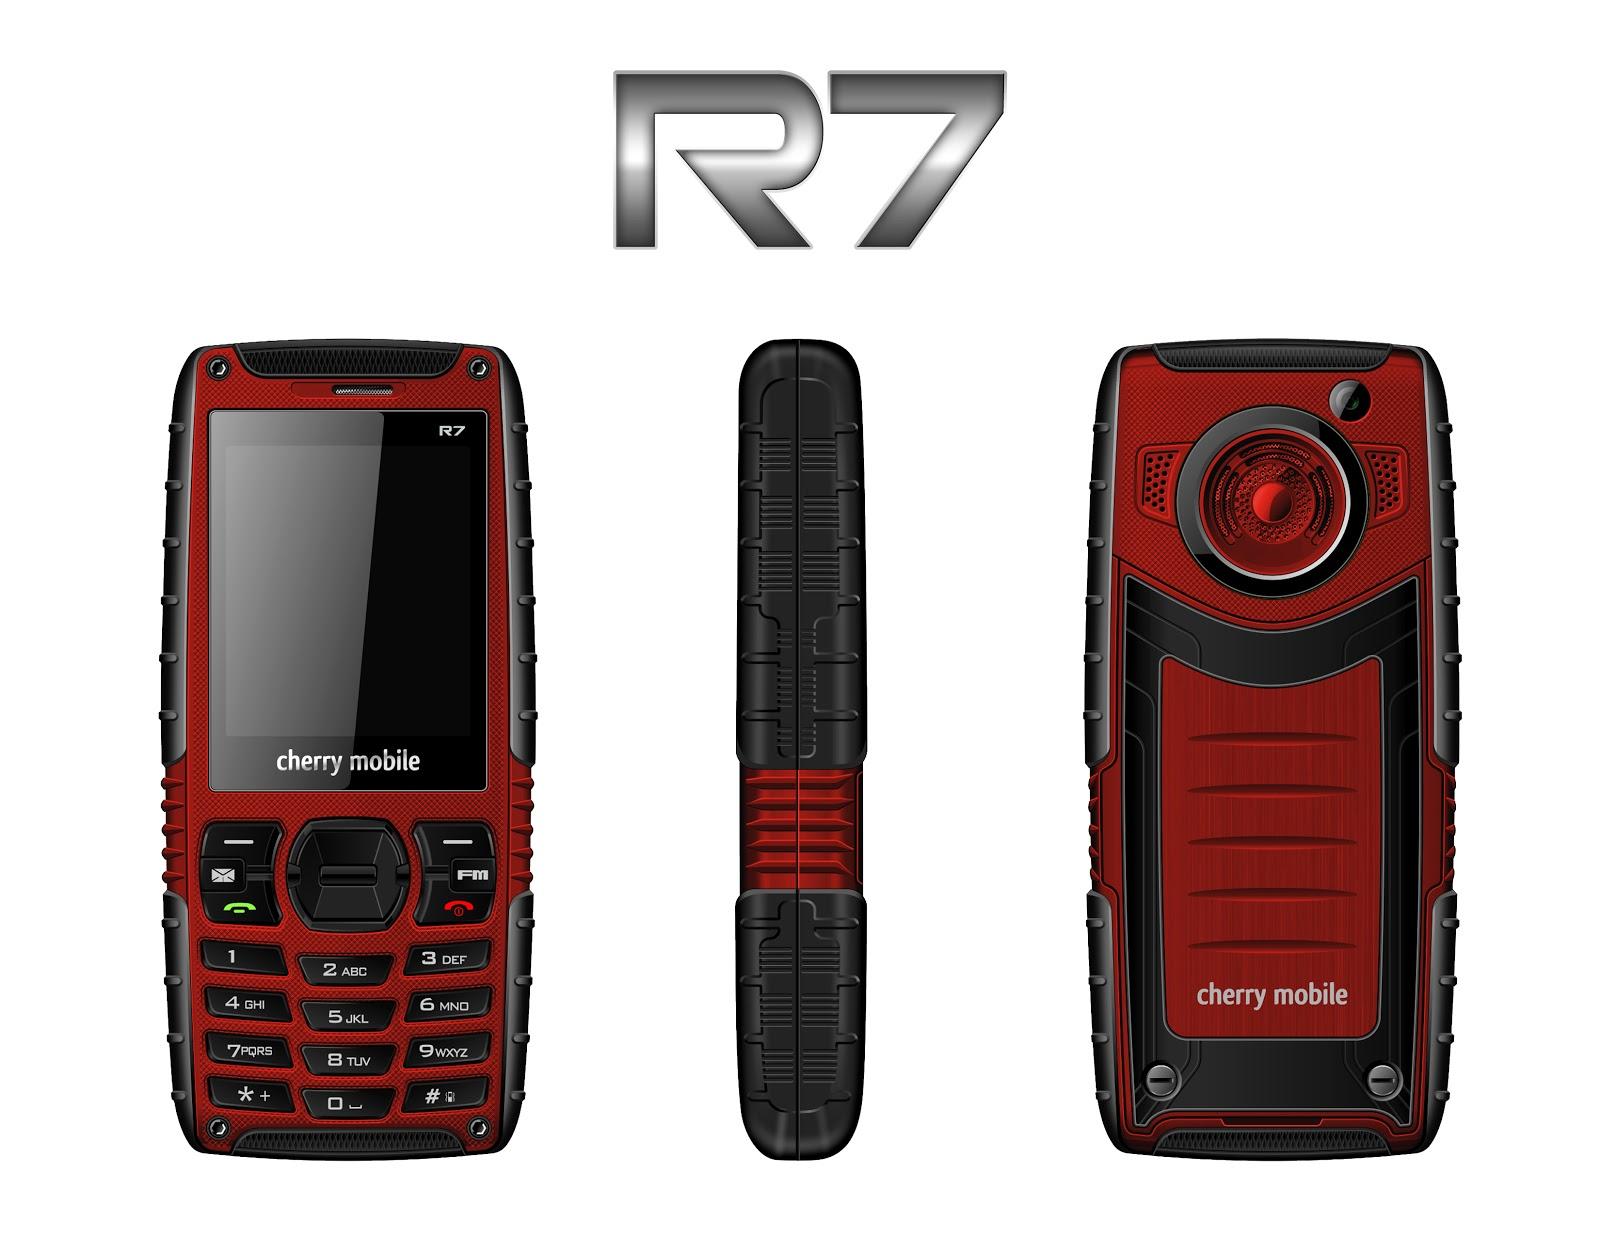 http://3.bp.blogspot.com/-r028X8wg_HI/TiFTvQdKW1I/AAAAAAAABic/pg07_82ImgE/s1600/Photo--Cherry+Mobile+R7+%2528Vigor%2529.jpg